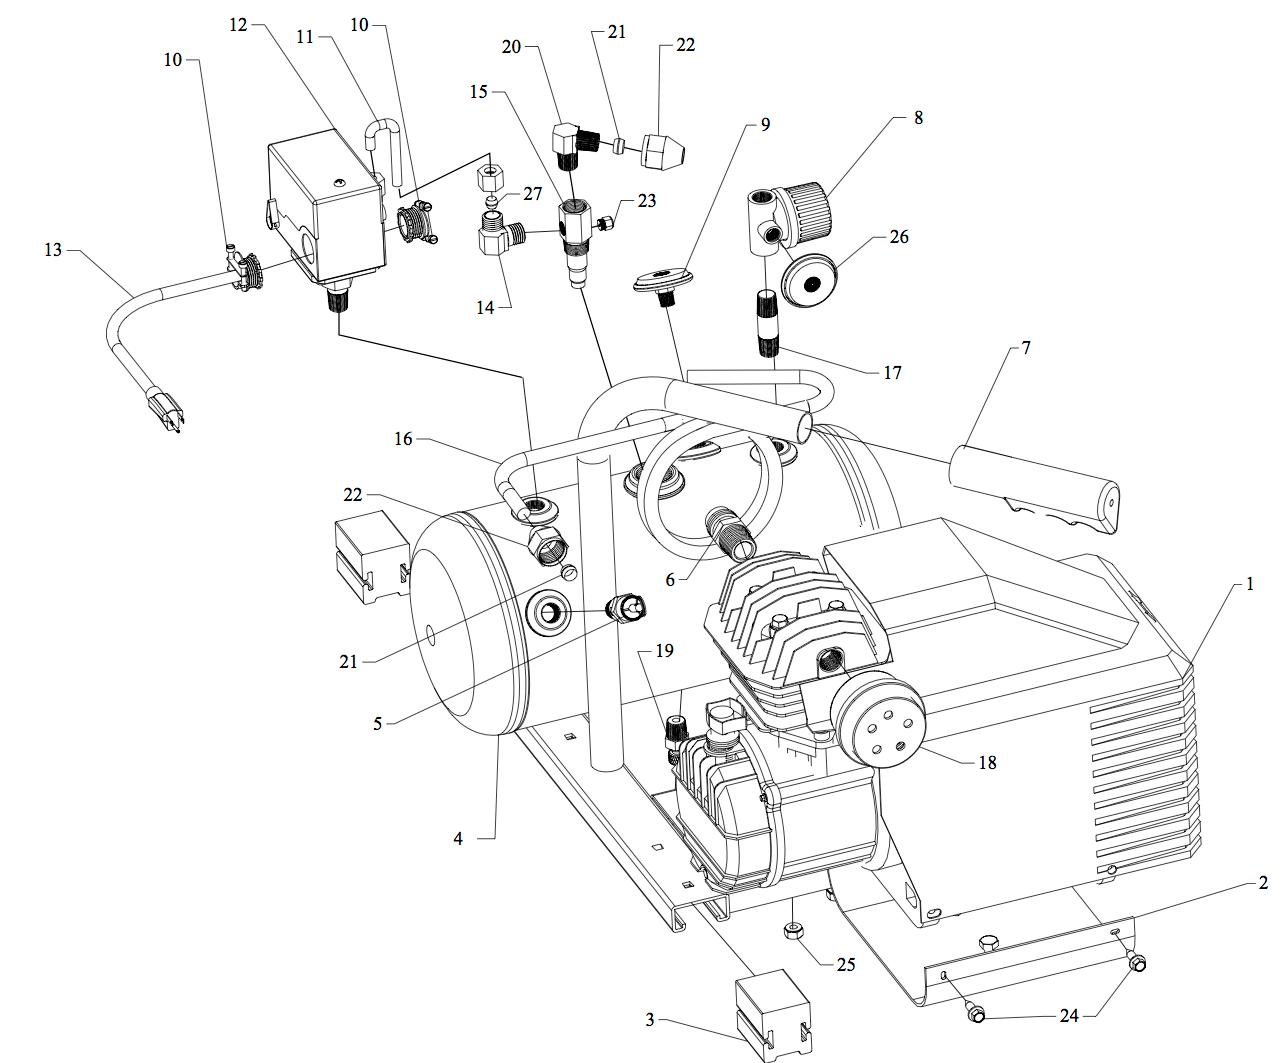 [DVZP_7254]   WN_0170] Wiring Diagram For Honda Vtx 1300 Wiring Diagram | Vtx 1800c Wiring Diagram |  | Hroni Nekout Hendil Mohammedshrine Librar Wiring 101